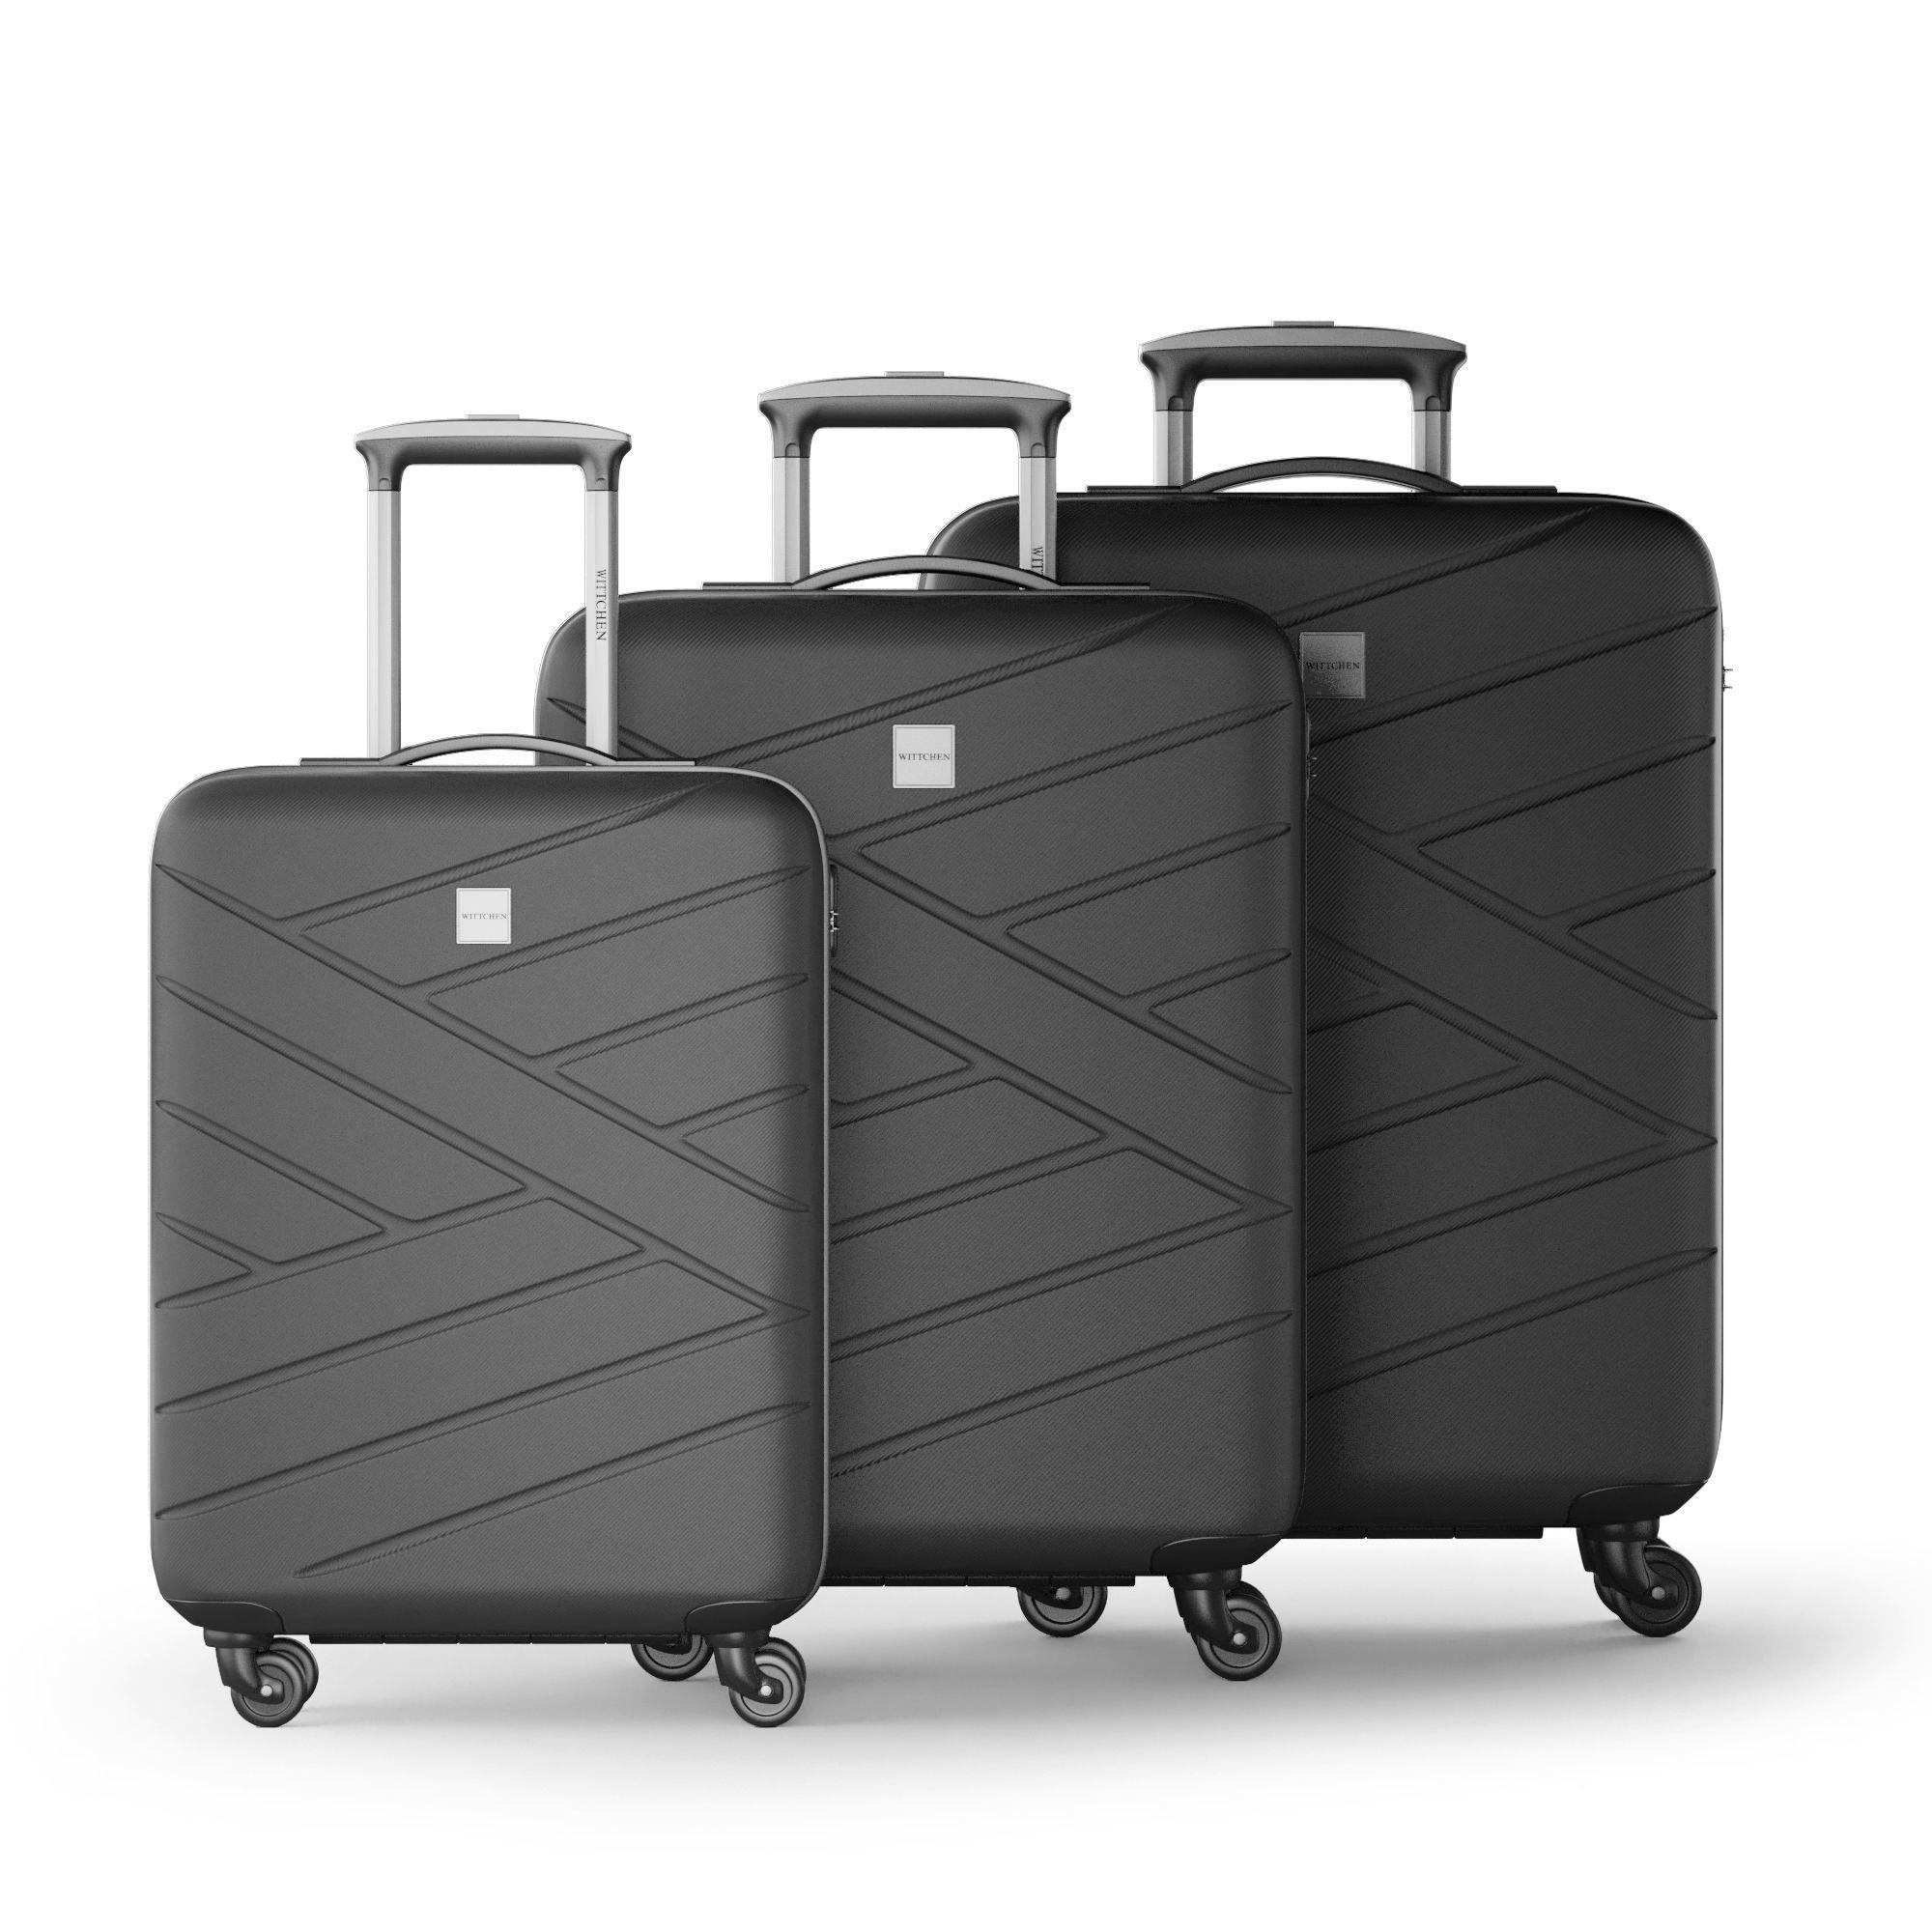 Wittchen Luggage Set